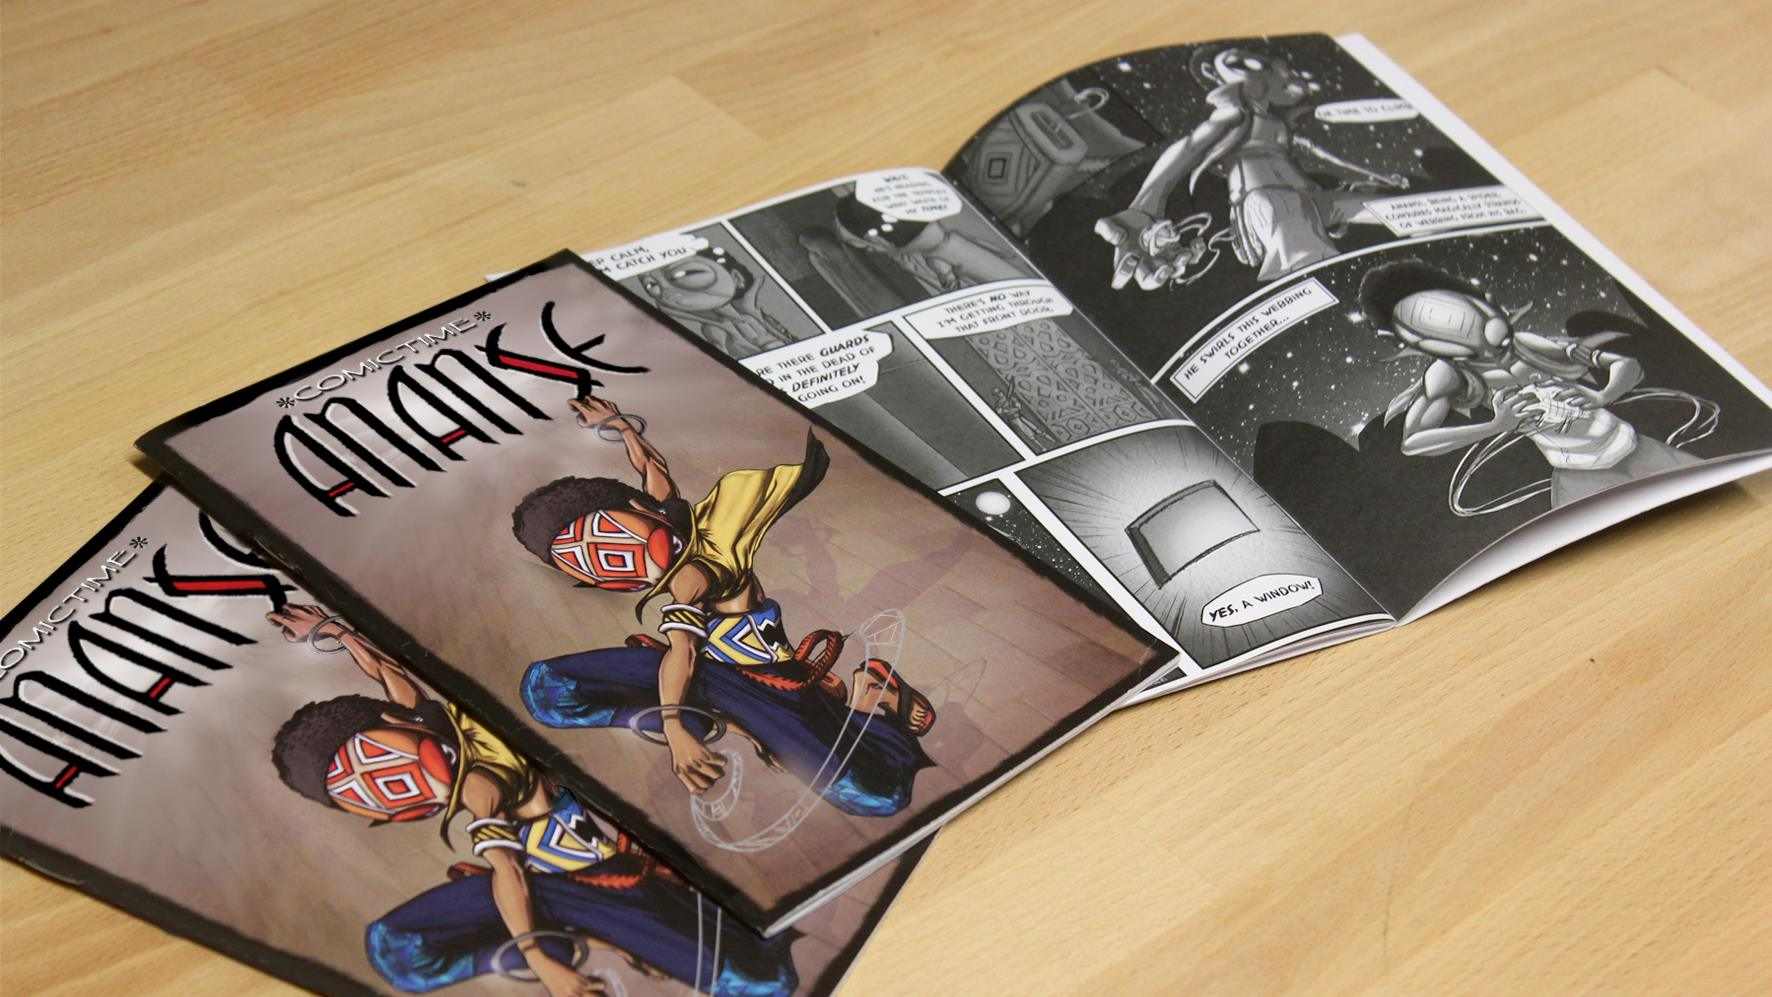 Ananse comic book by Kiaski Donkor